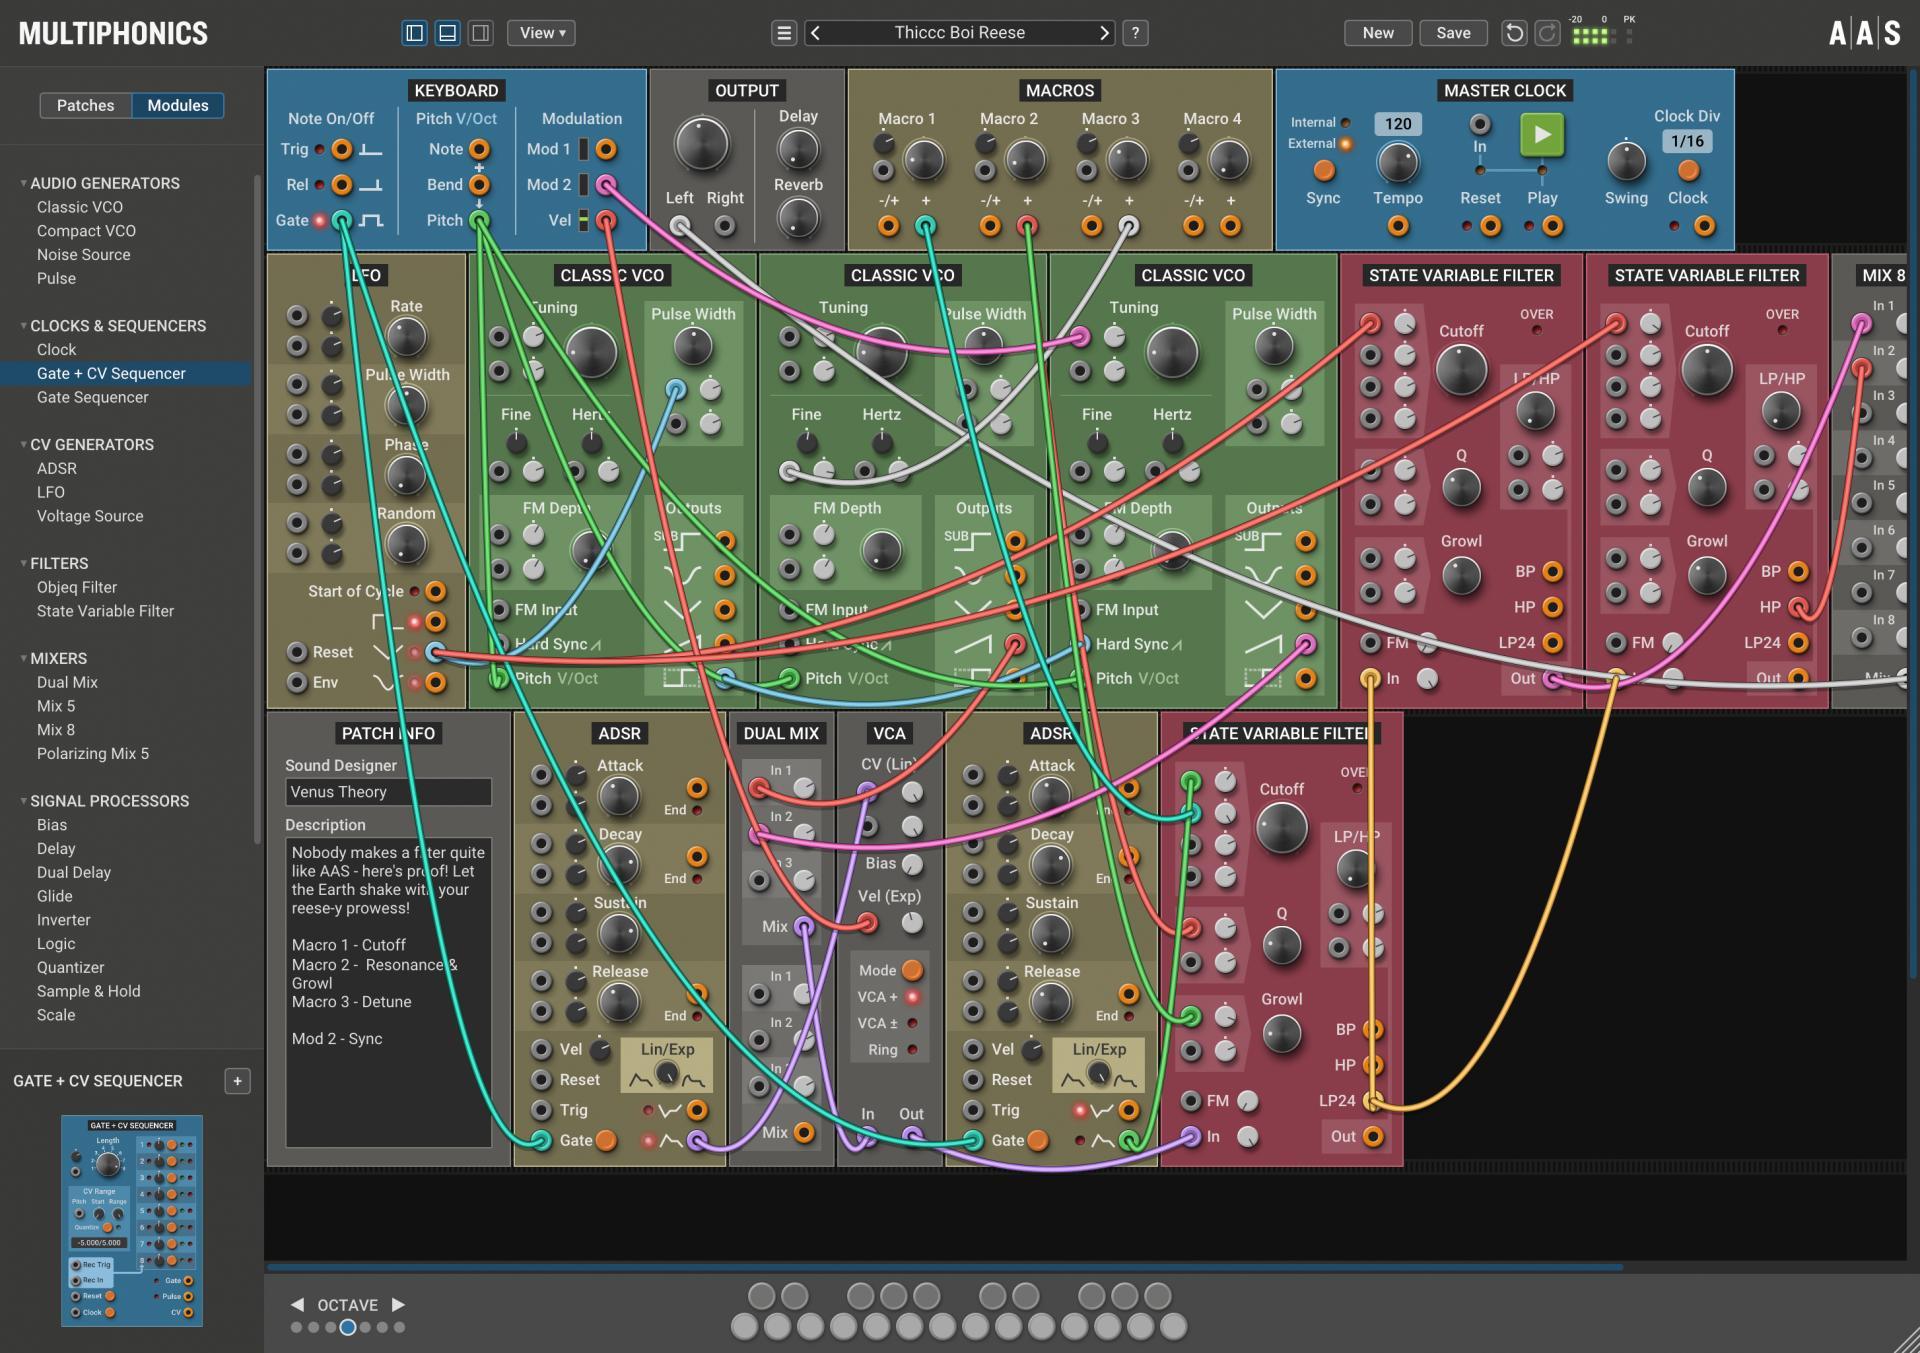 aas-multiphonics-cv-1-screenshot-1.png.jpg